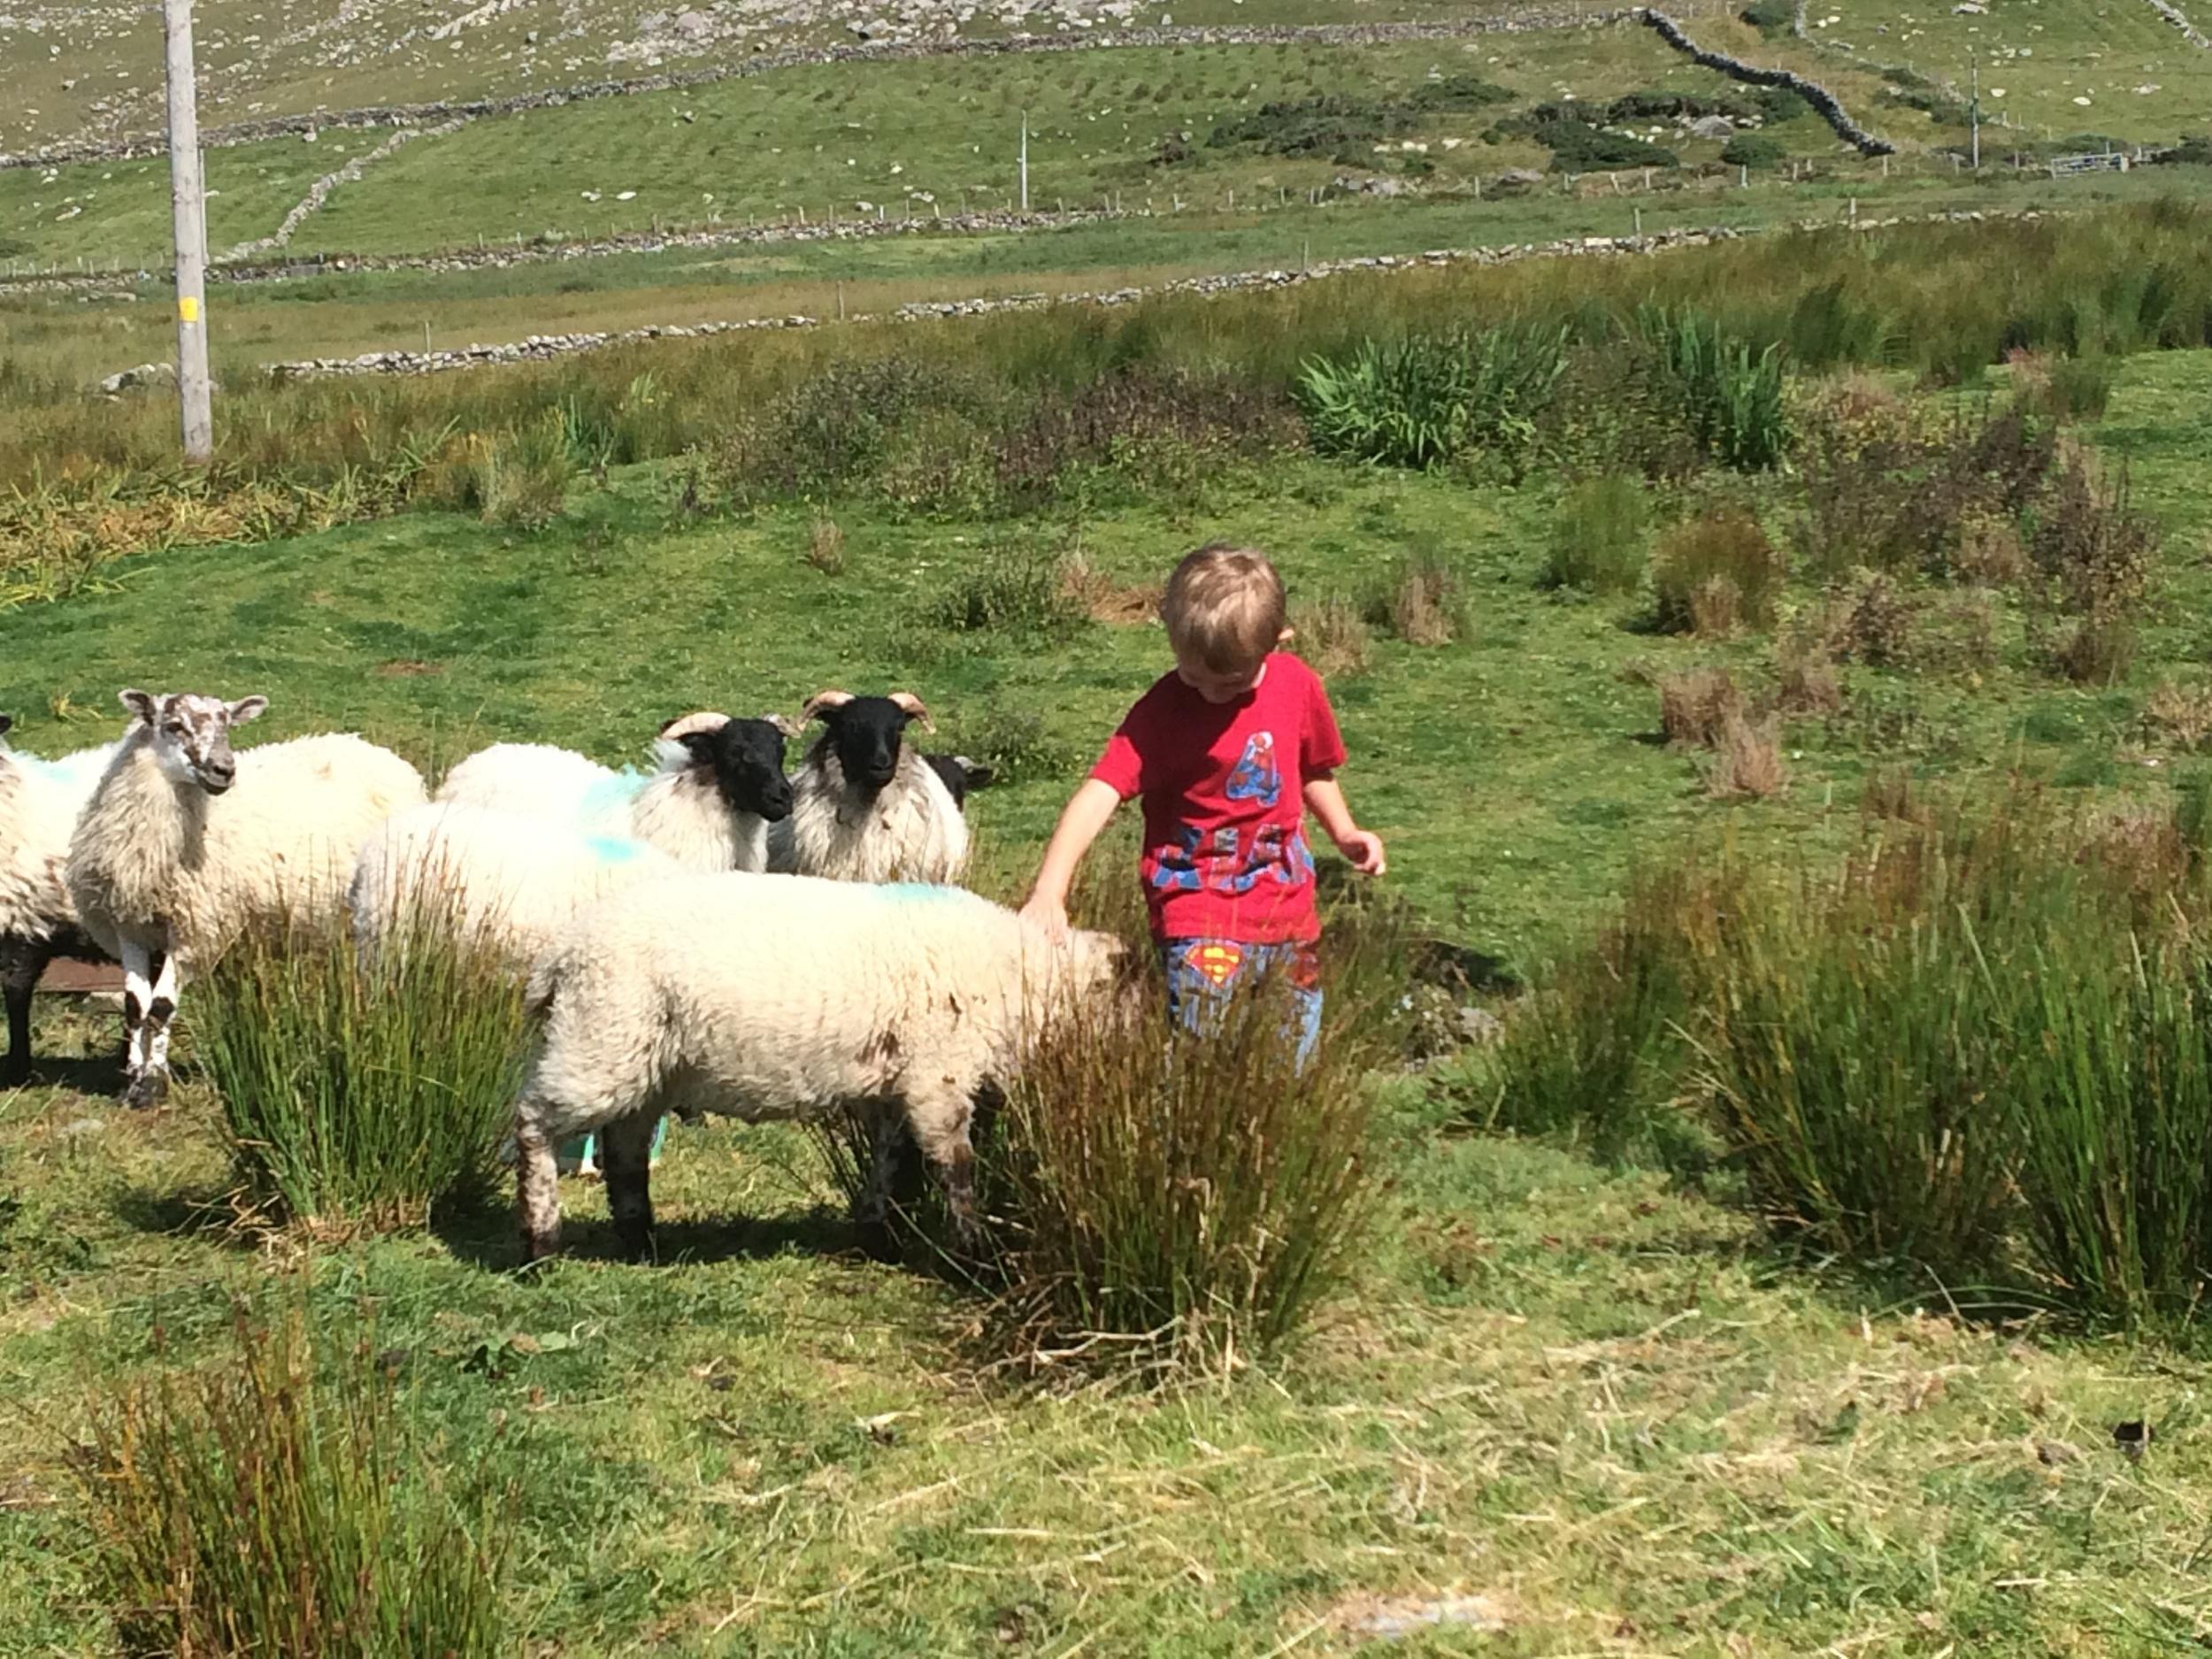 Kian with the Pet Lambs